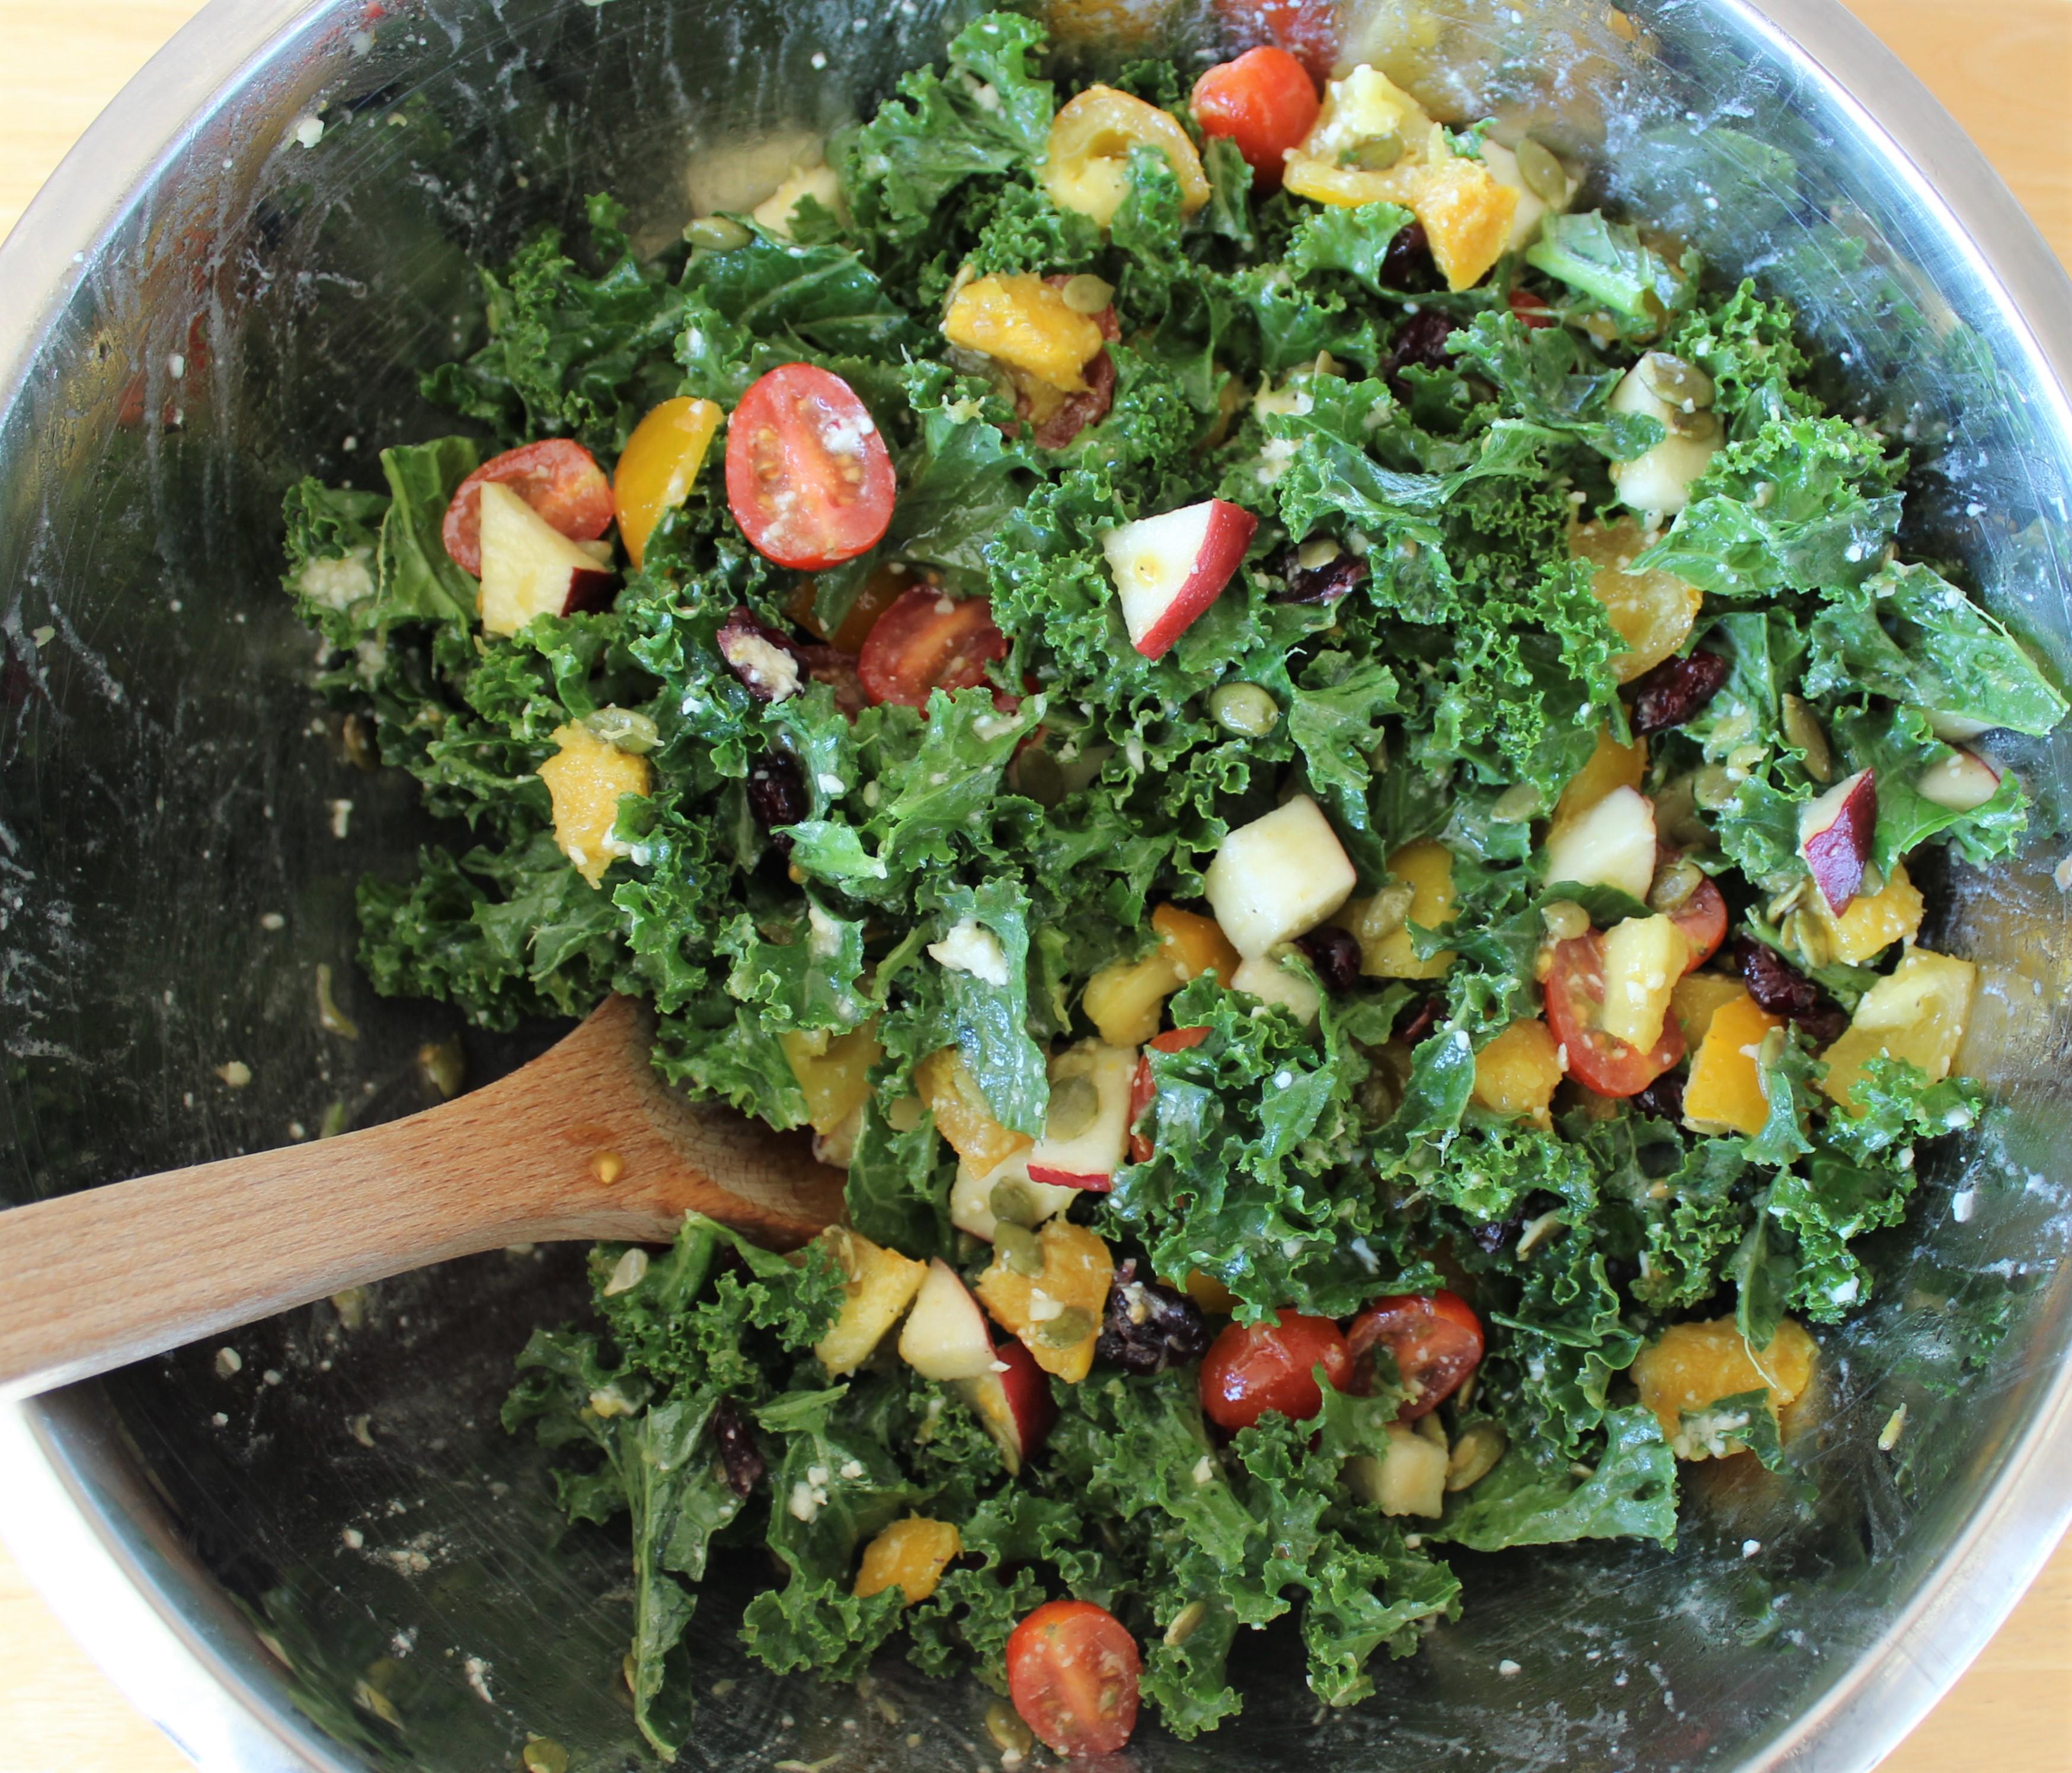 Autumn Salad with Creamy Parmesan Dressing 2